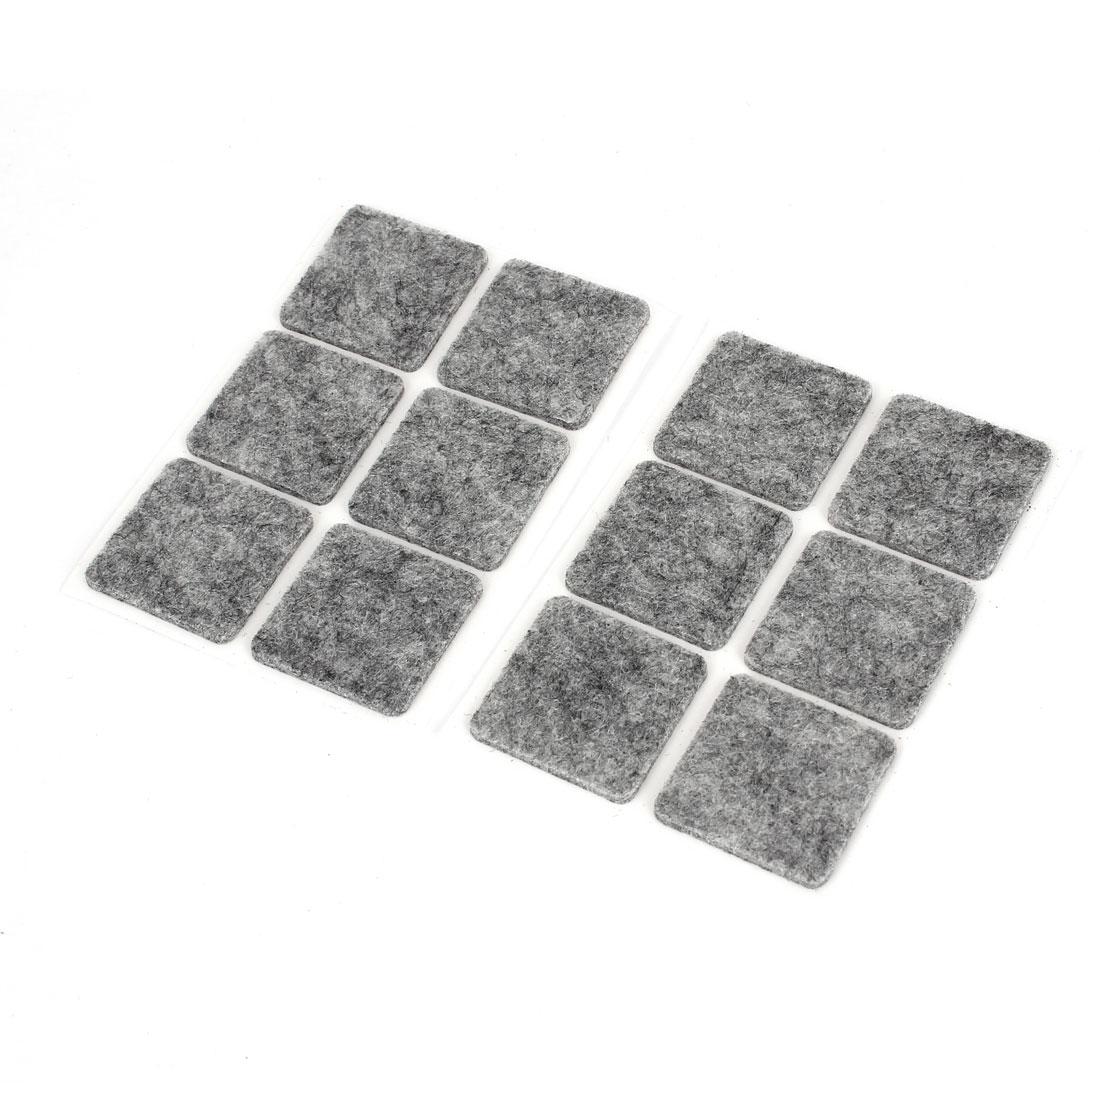 Gray Self Adhesive Felt Pad Furniture Table Chair Legs Floor Protectors 12pcs